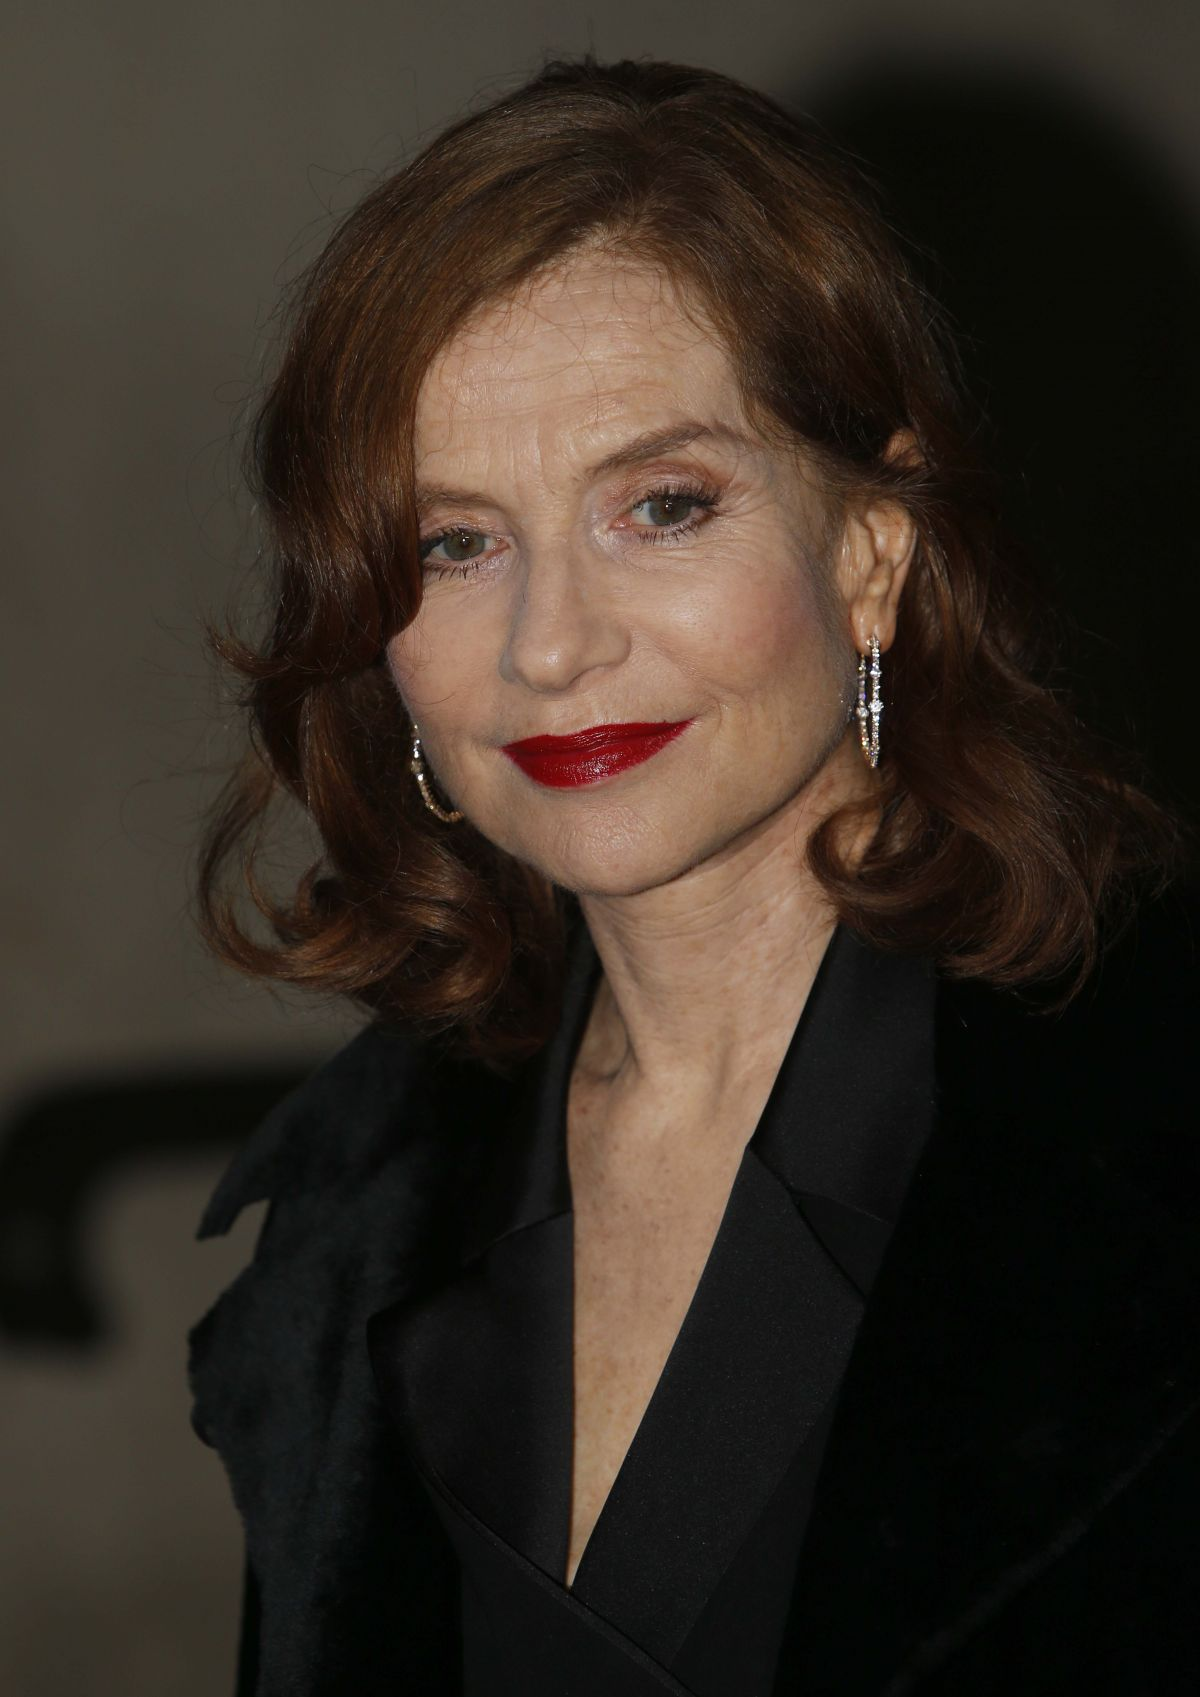 Isabelle Huppert - IMDbPro